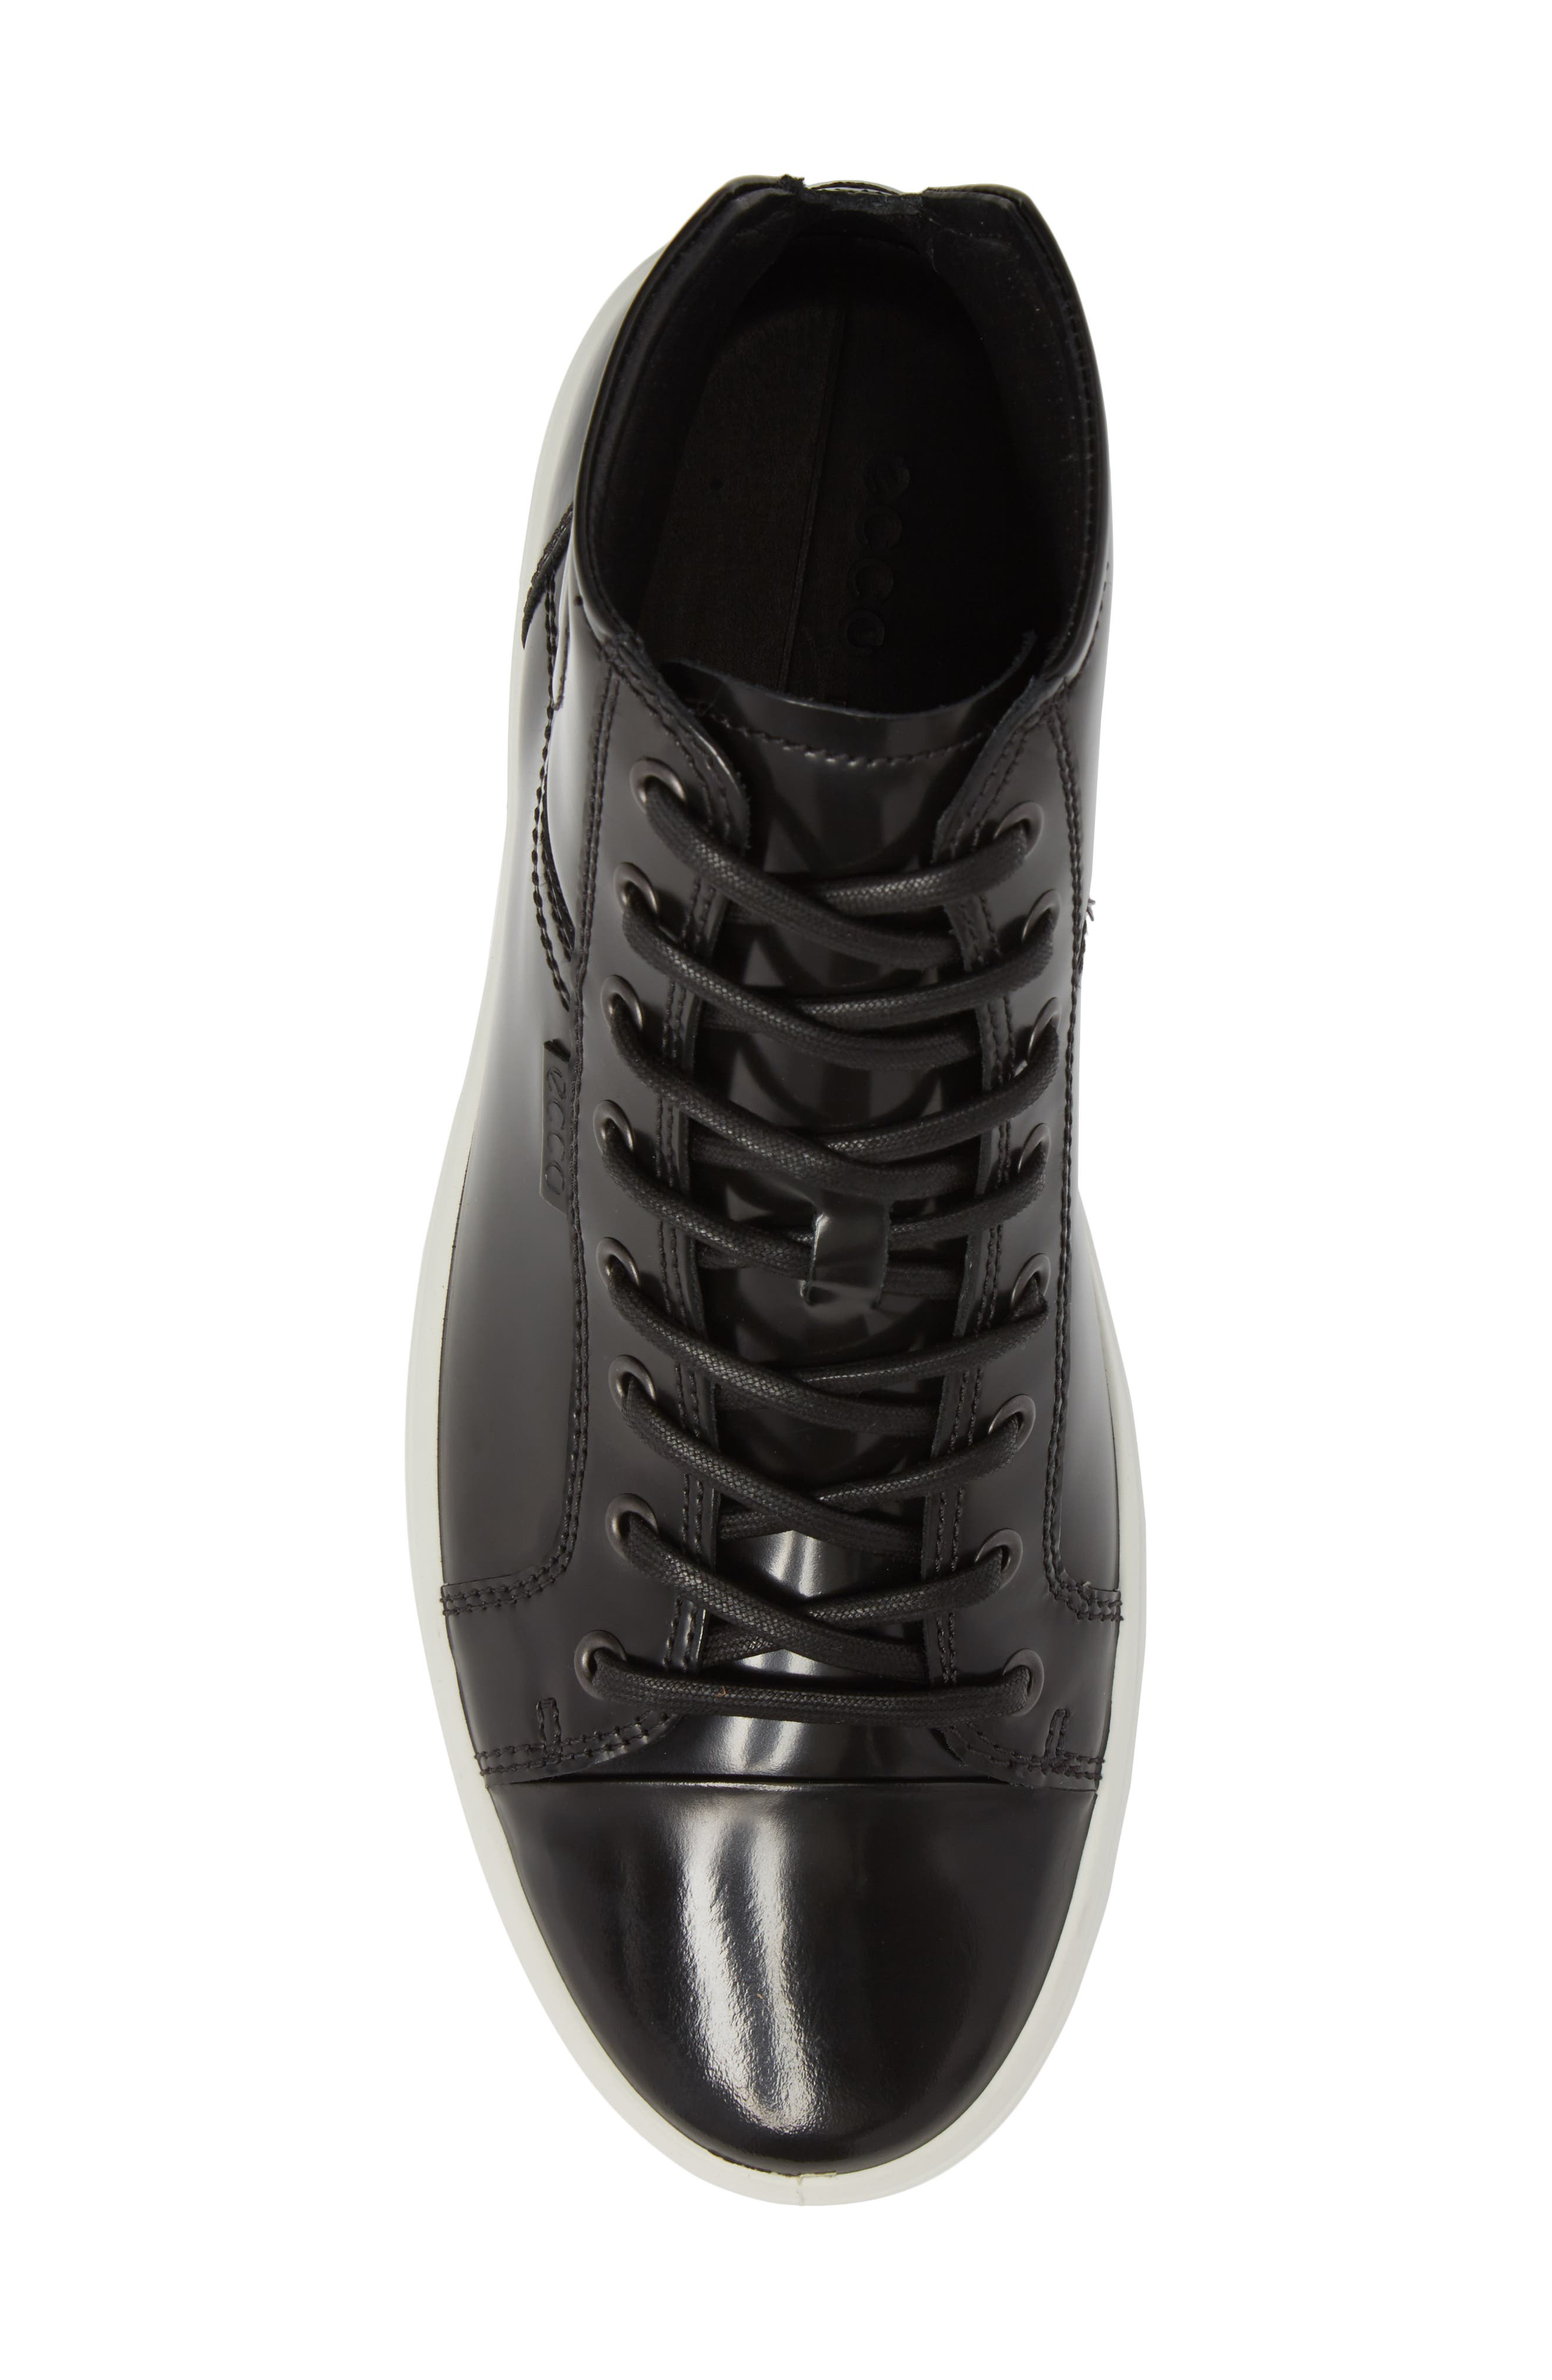 Soft 7 Premium High Top Sneaker,                             Alternate thumbnail 5, color,                             Black Leather